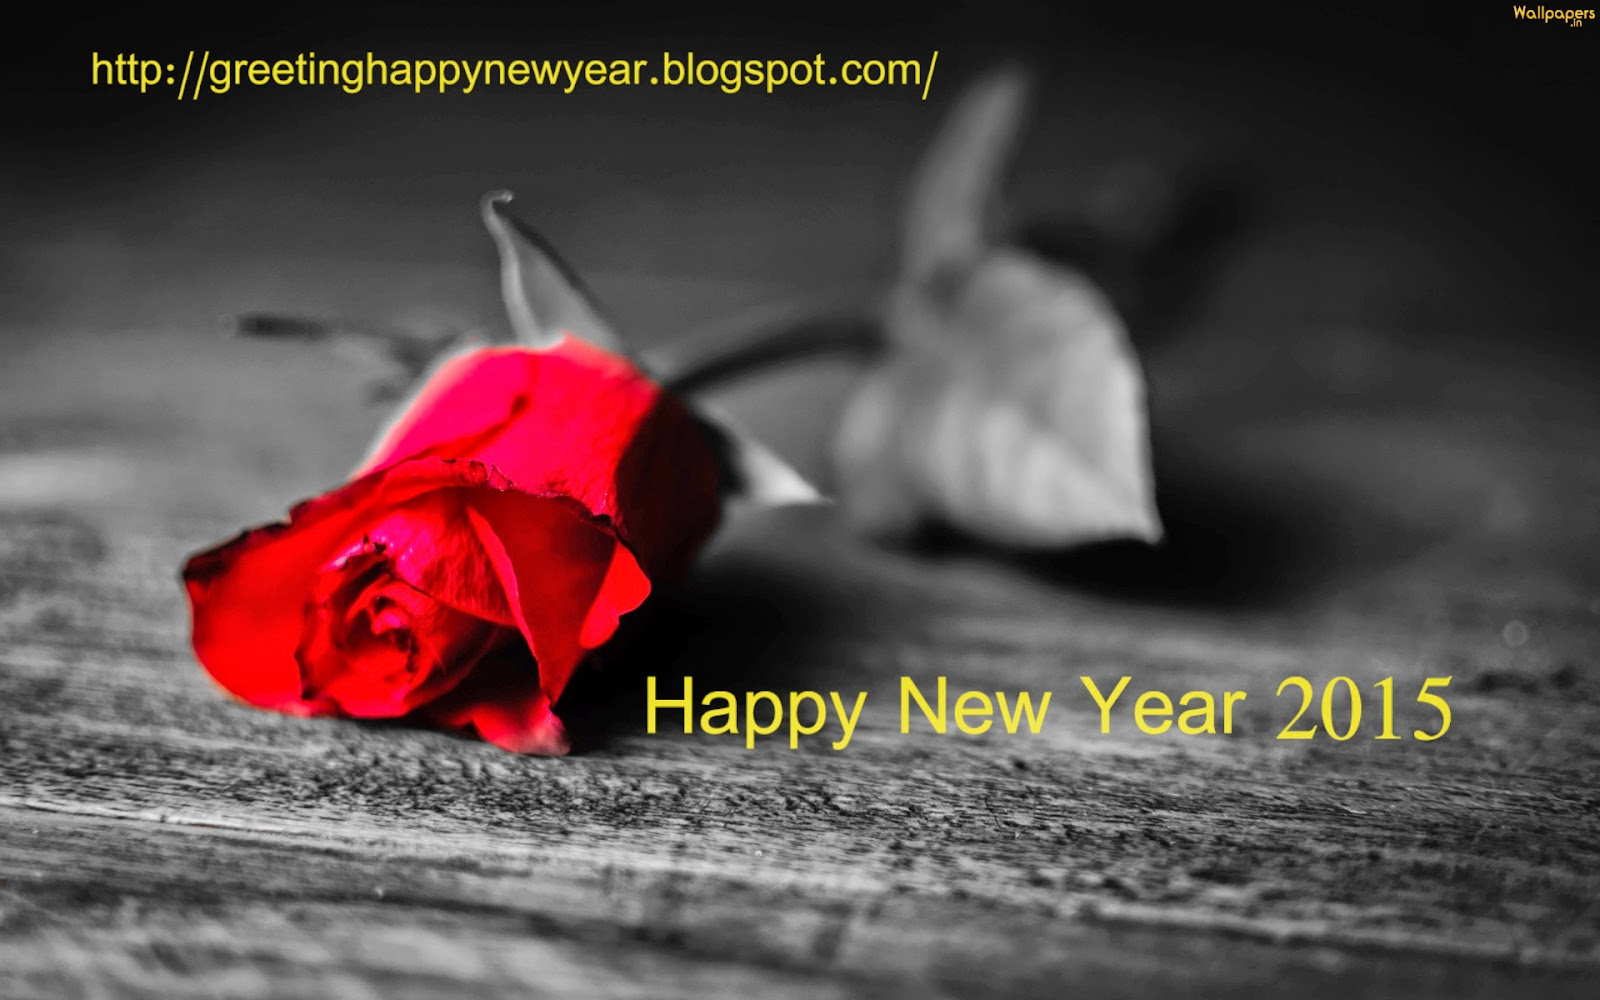 HAPPY NEW YEAR 2015 ROSE HD WALLPAPER - NEW LATEST WALLPAPER